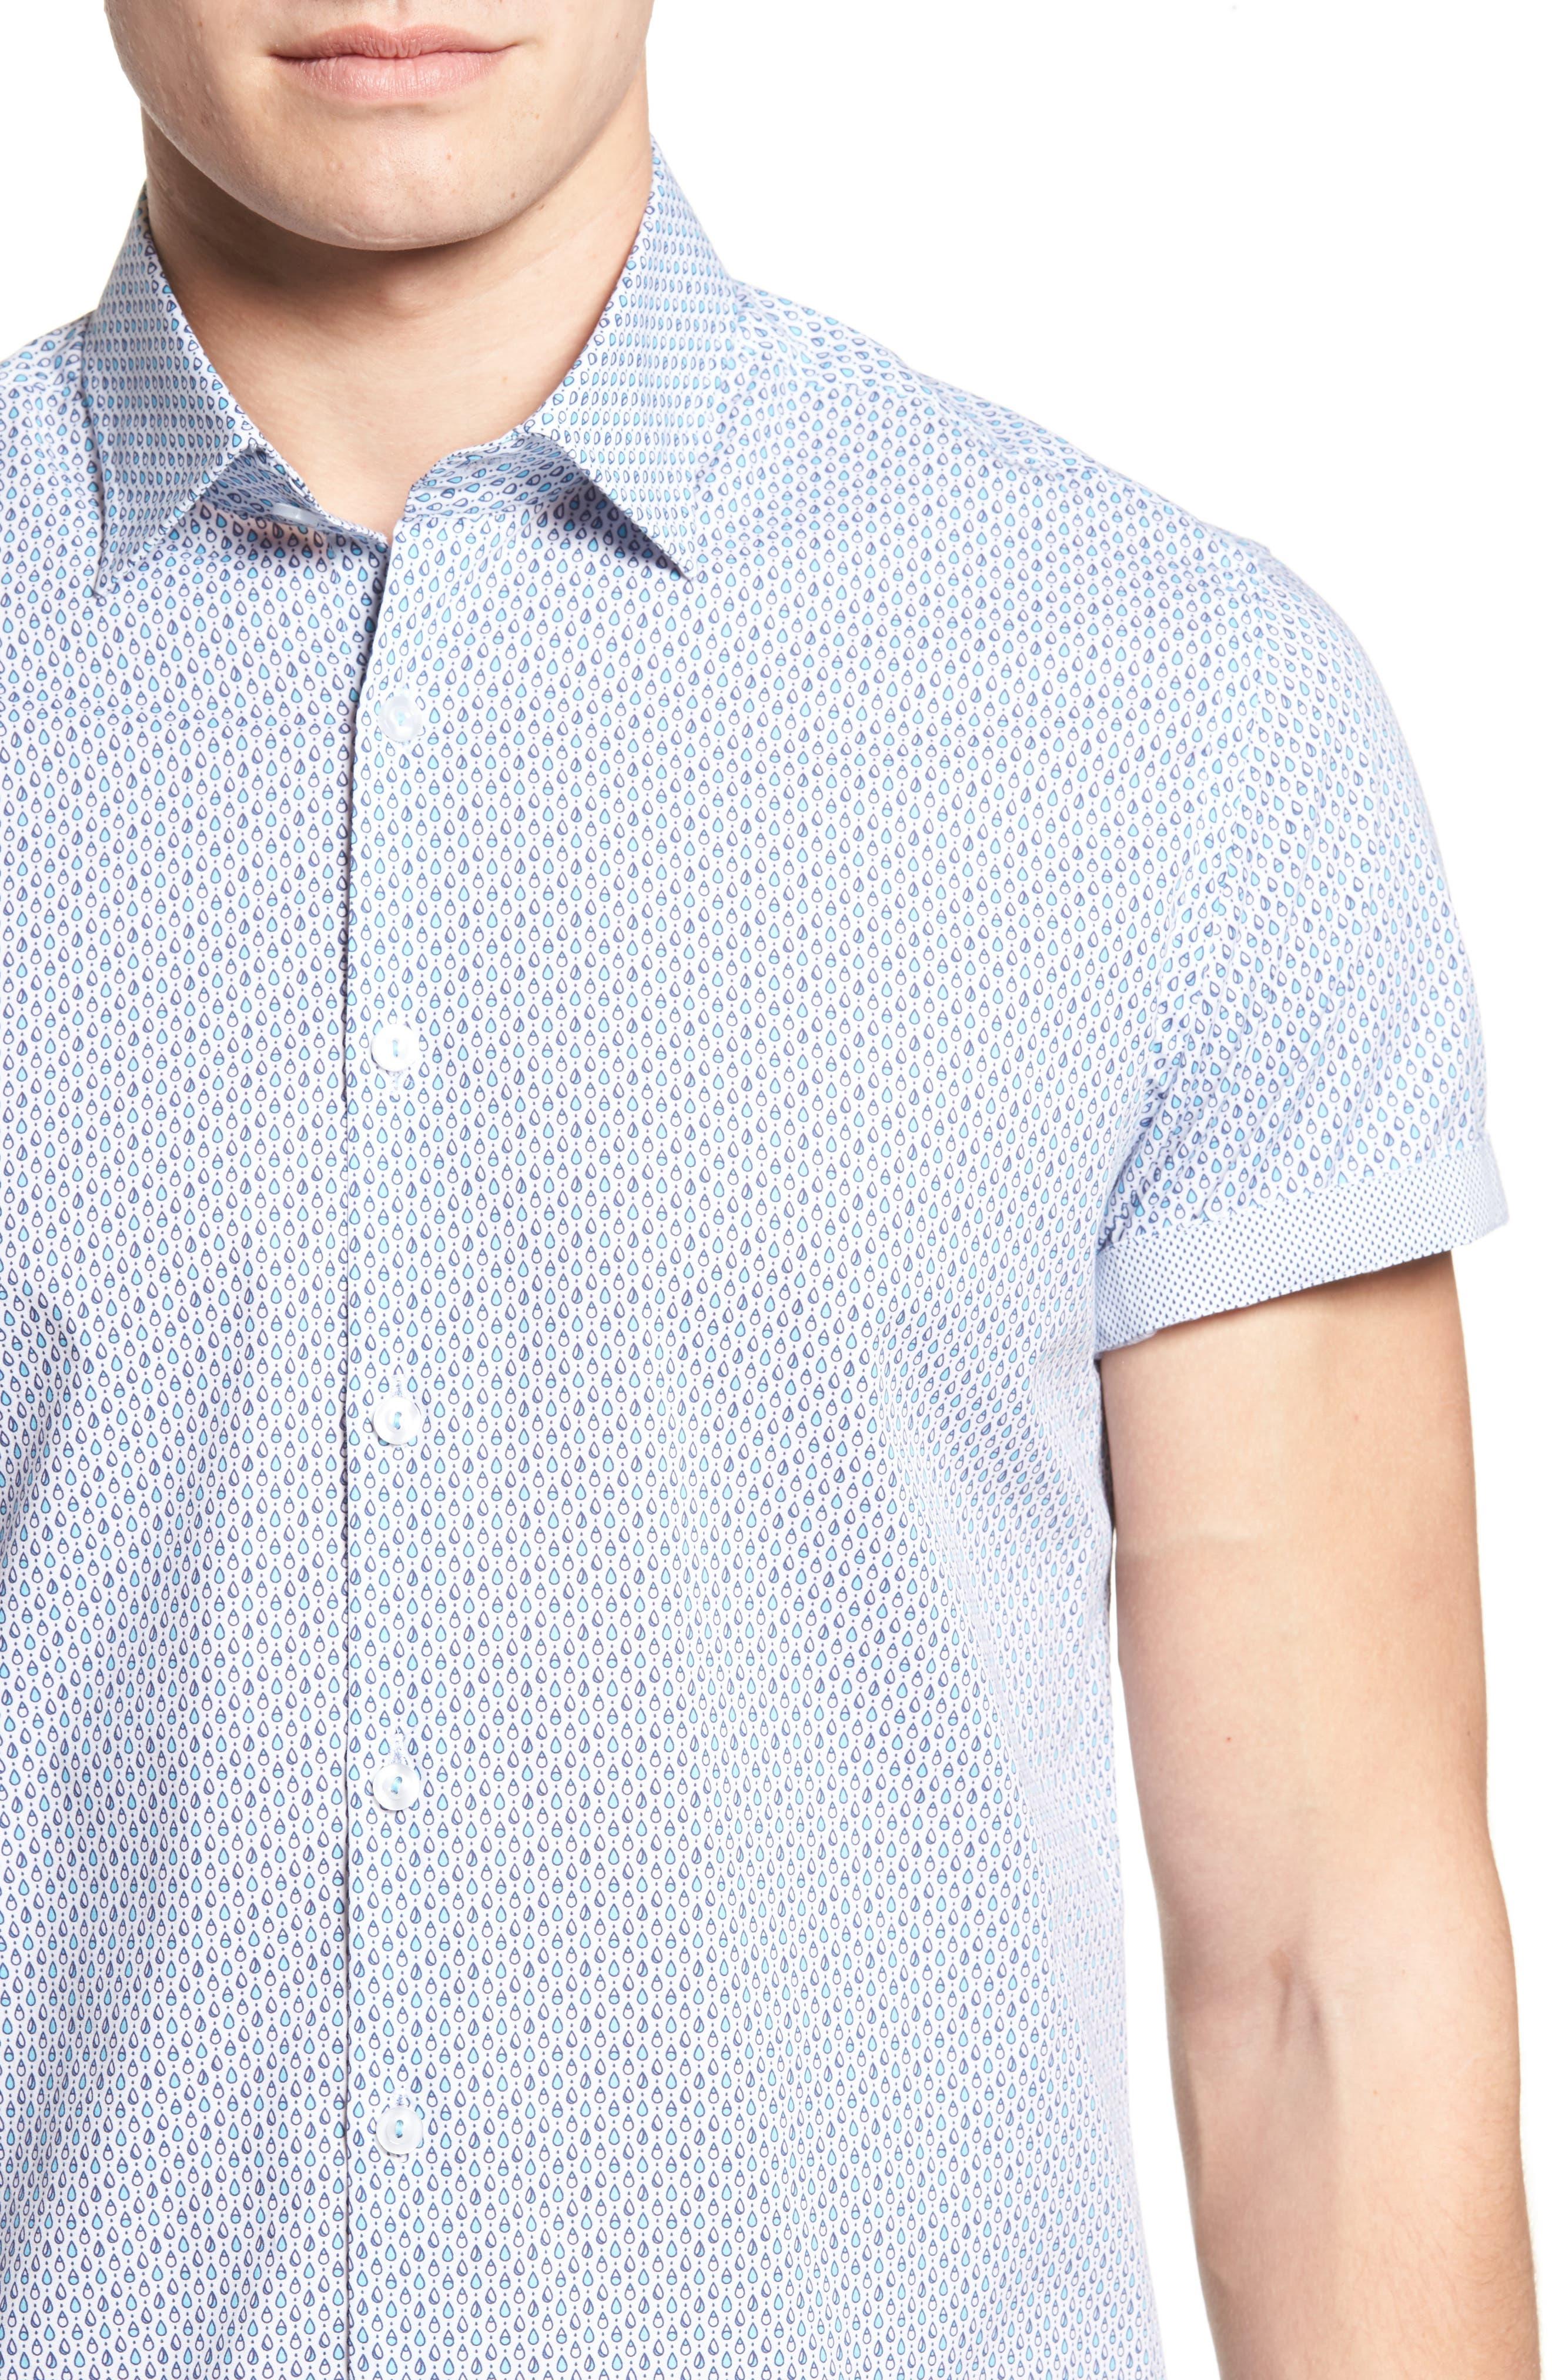 Trim Fit Teardrop Sport Shirt,                             Alternate thumbnail 4, color,                             White